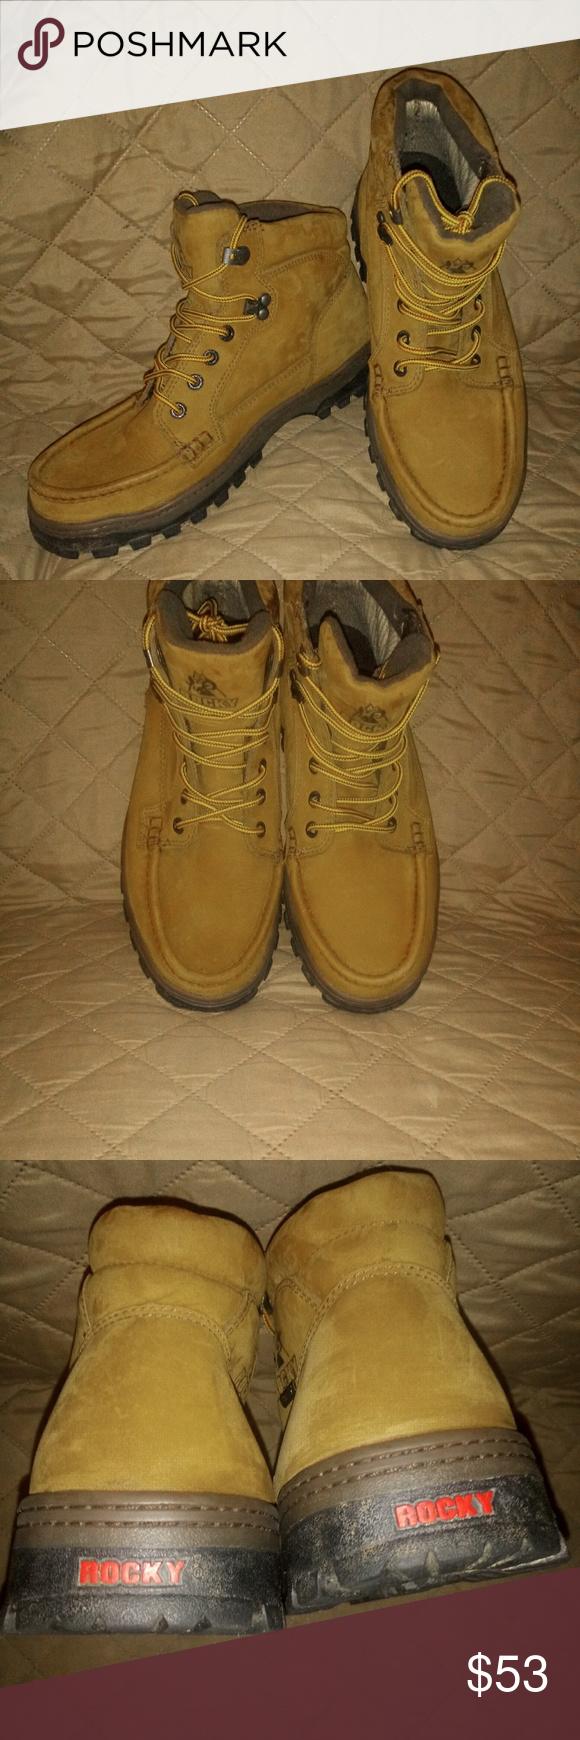 b01d76c2401 Rocky Outback Gore-Tex Waterproof Hiker Boots NWOT Men's size 8 Wide ...